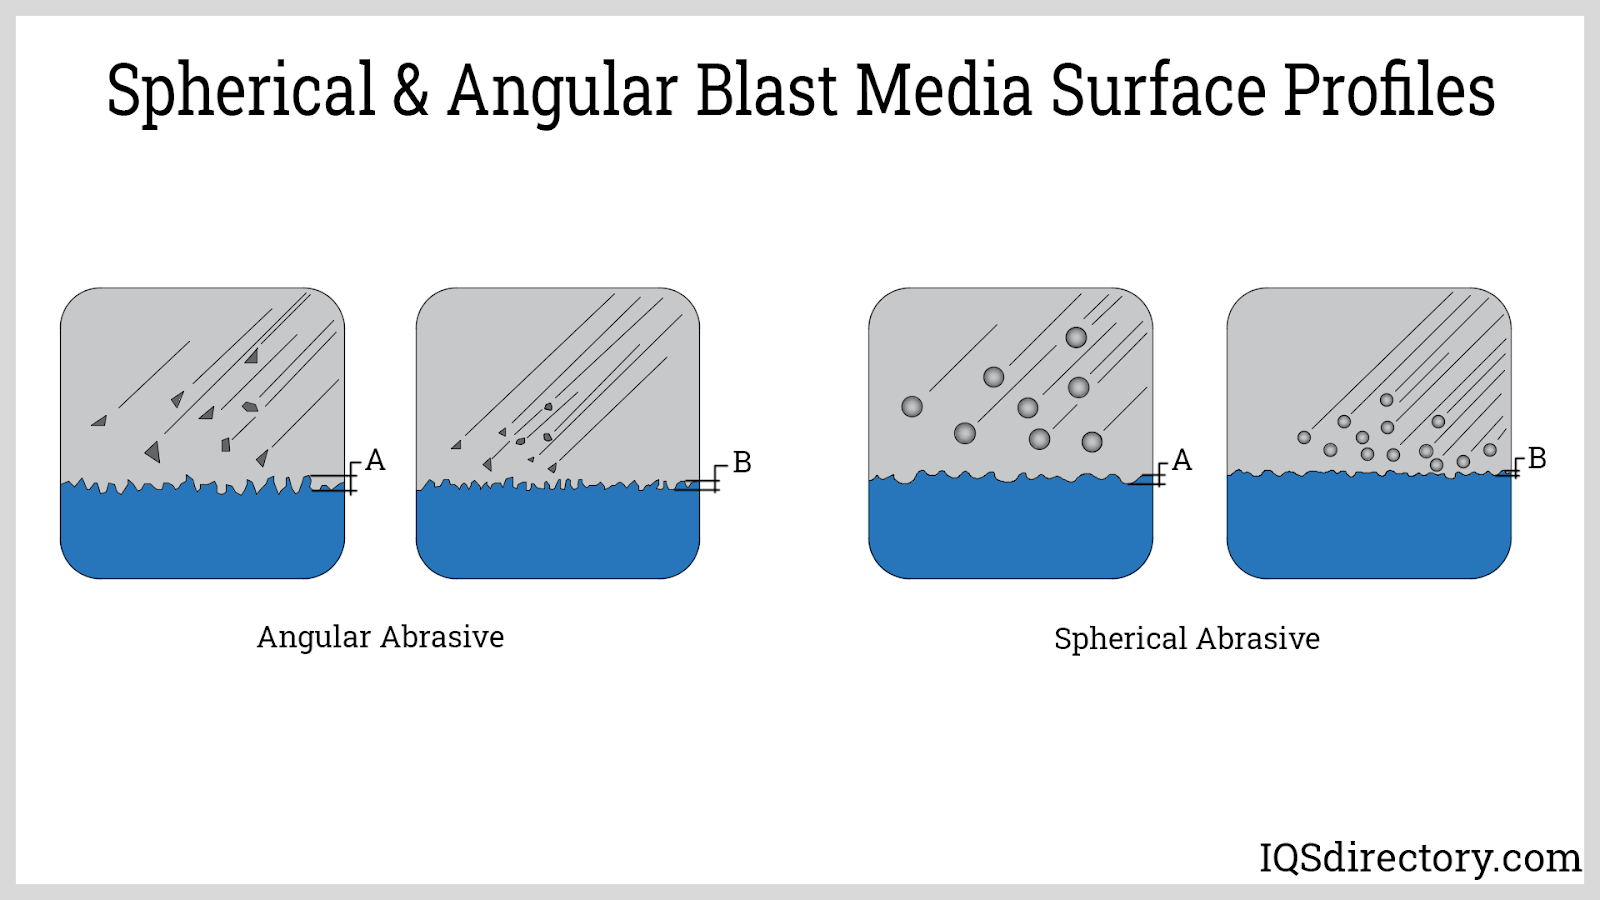 Spherical & Angular Blast Media Surface Profiles